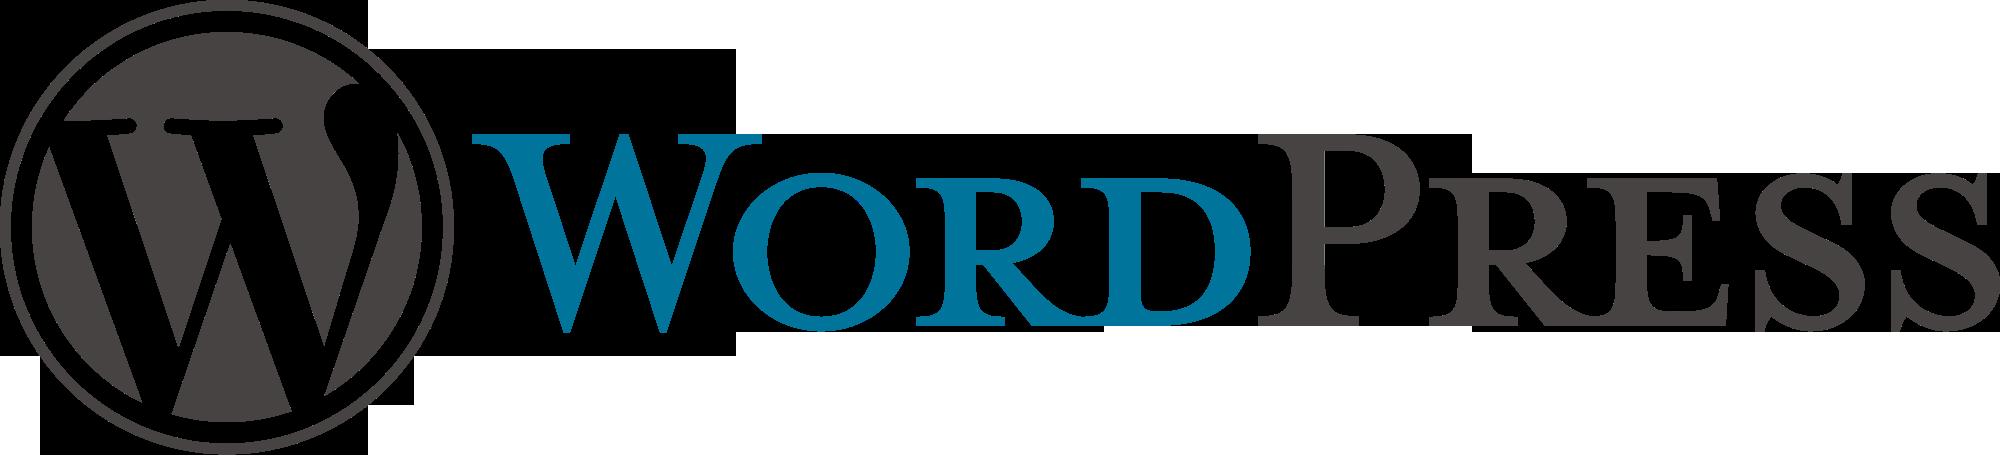 Rickd webdesign WordPress specialist